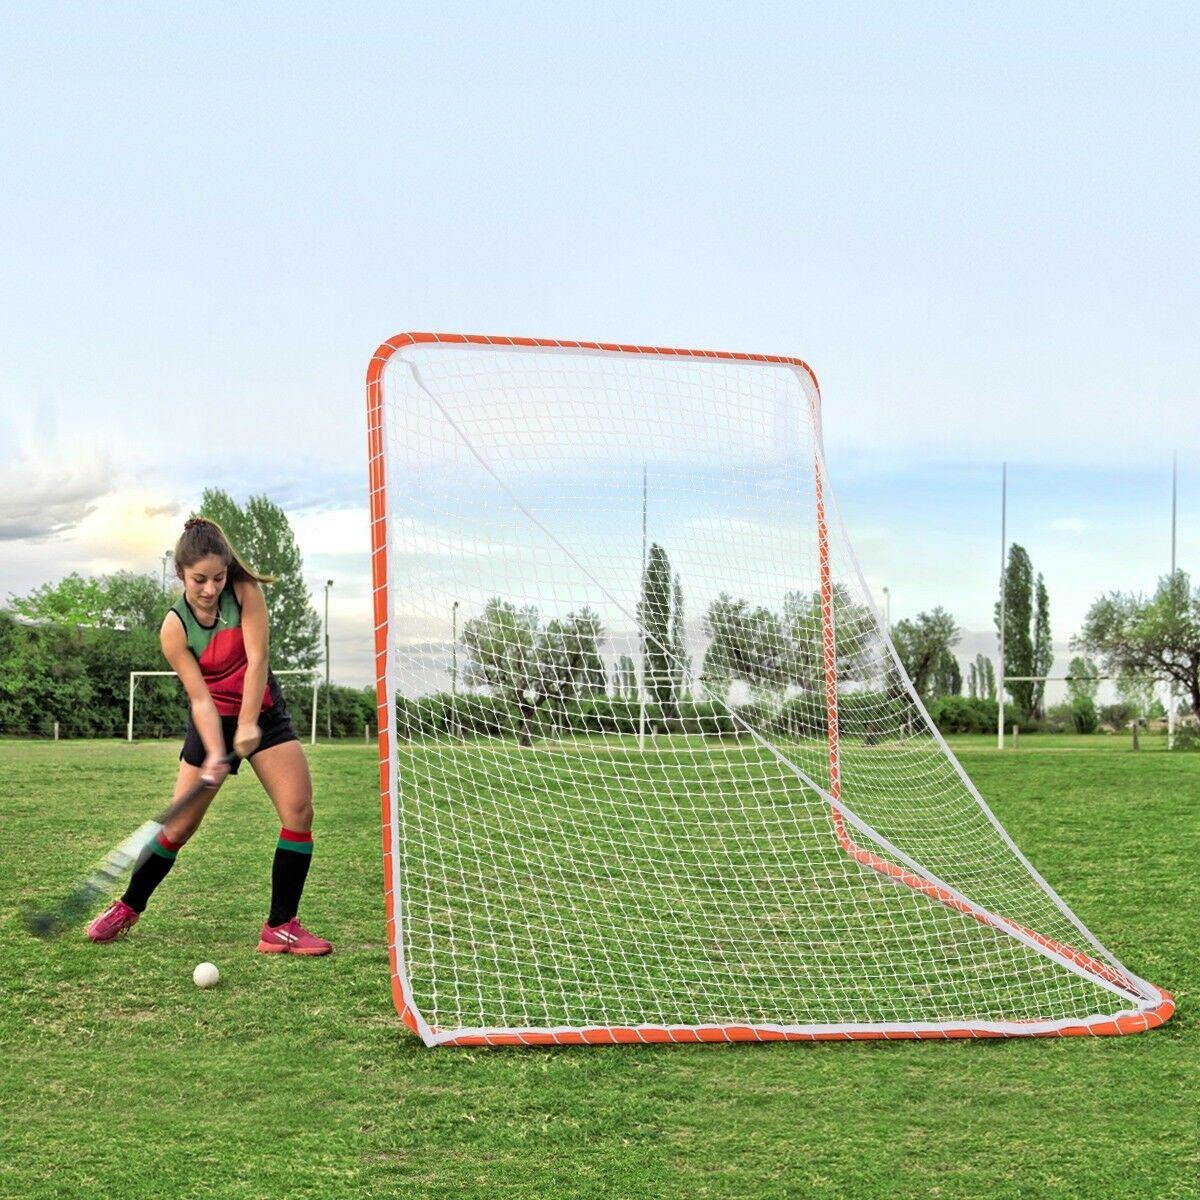 6 X 6 Portable Lacrosse Practice Net For Sport Training Lacrosse Practice Sports Training Lacrosse